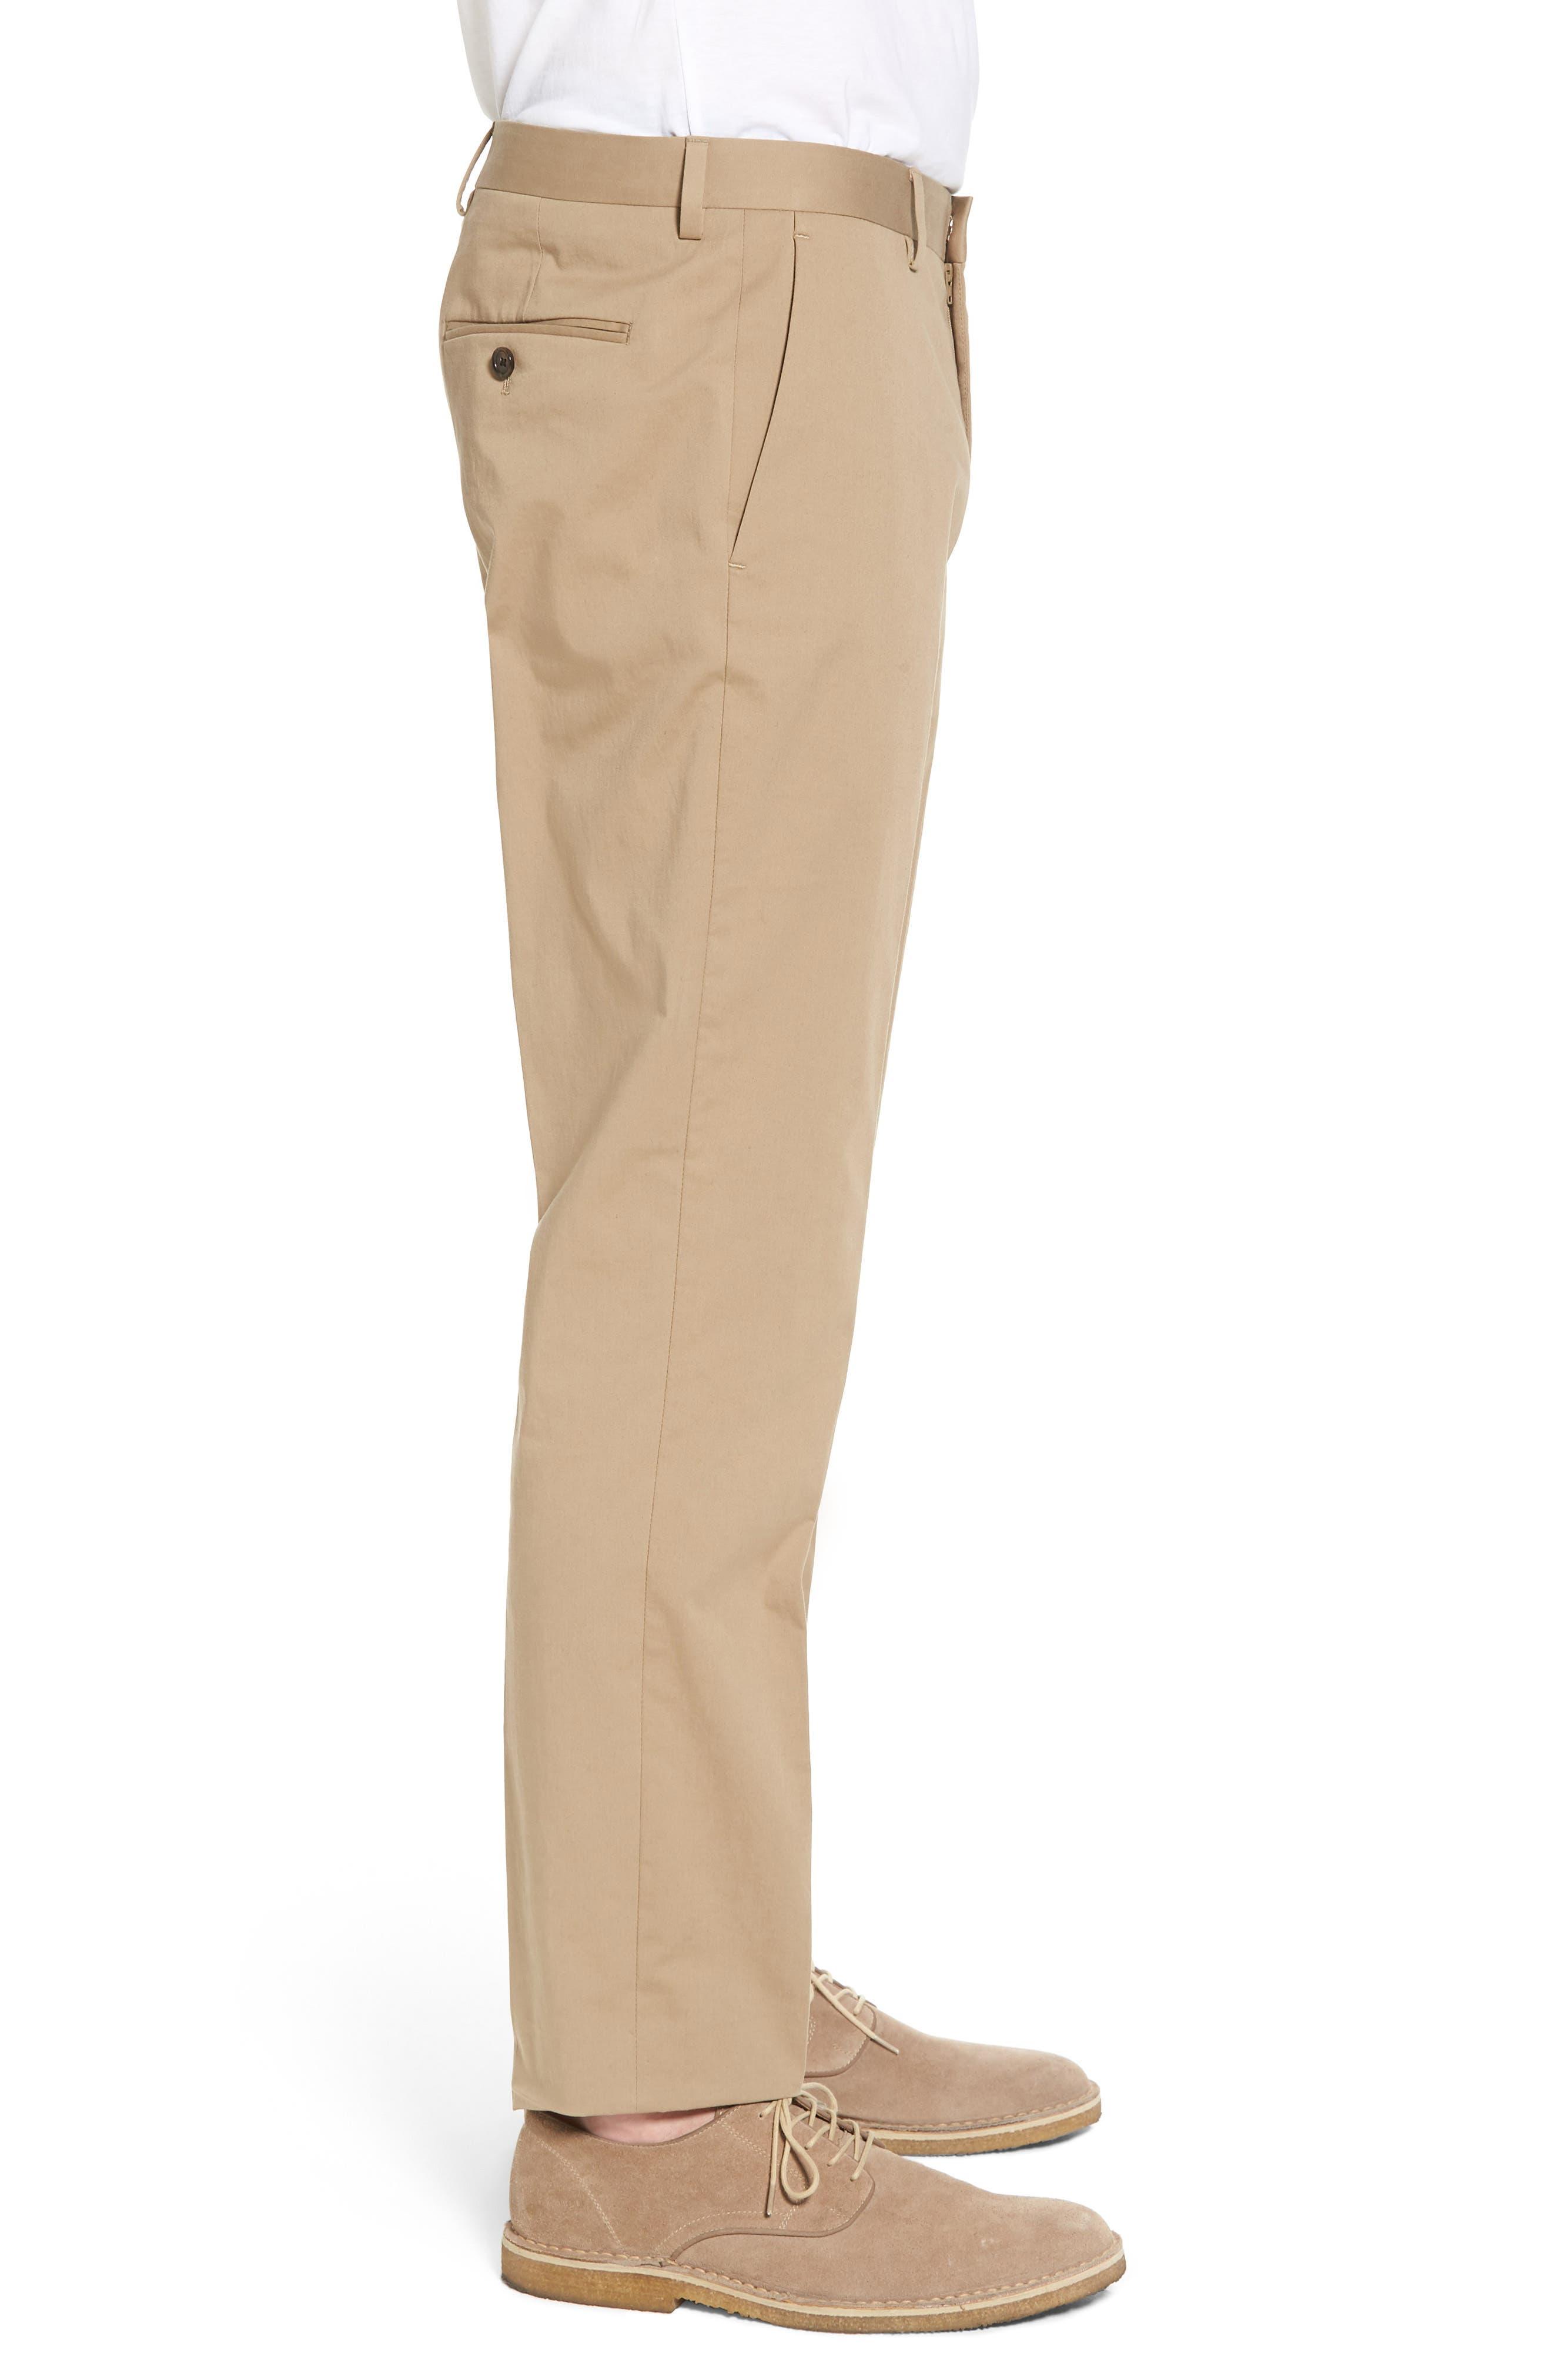 J.Crew Ludlow Stretch Chino Suit Pants,                             Alternate thumbnail 3, color,                             Khaki